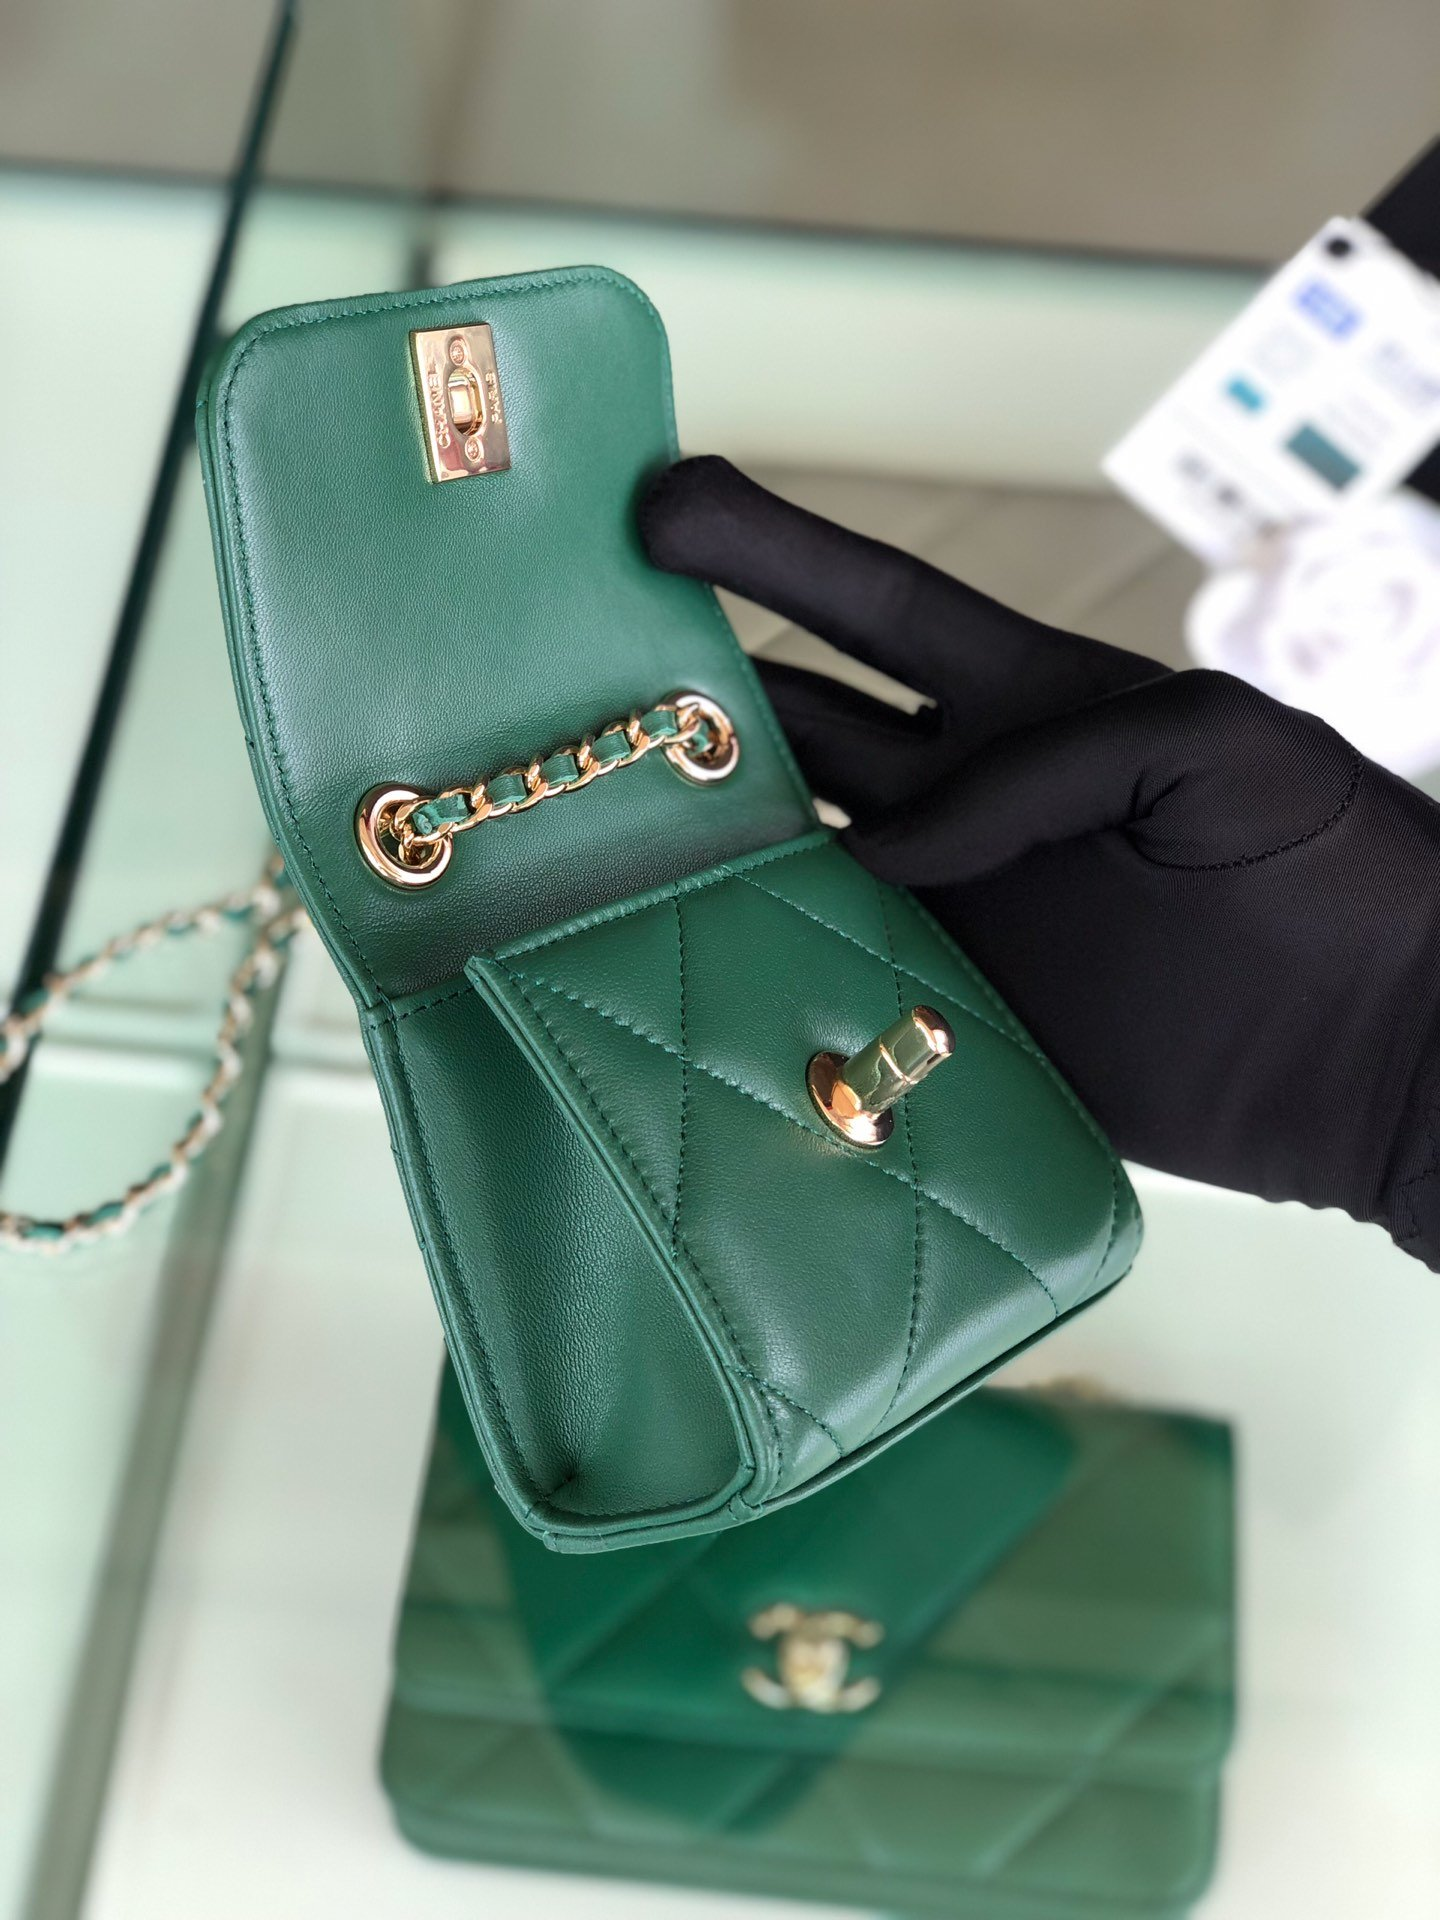 Chanel香奈儿专柜同款 大方格新款零钱包 单肩斜挎(图8)